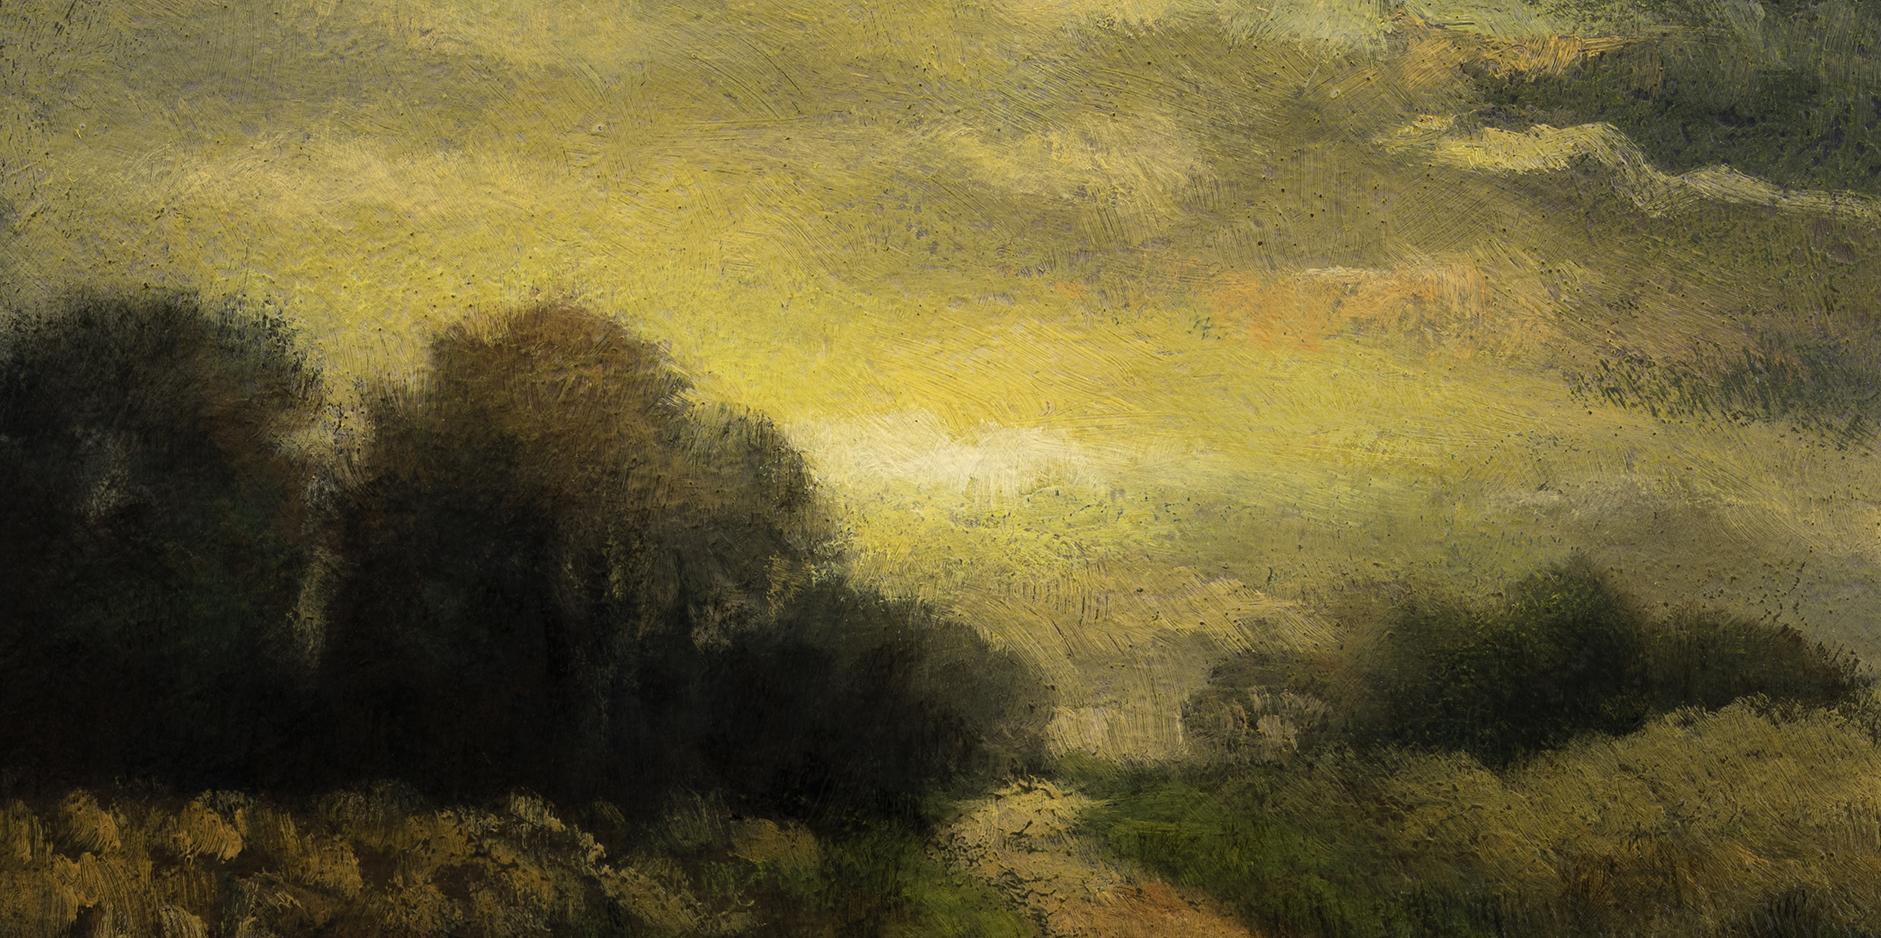 Evening Haze   by M Francis McCarthy - 5x10 (Detail)